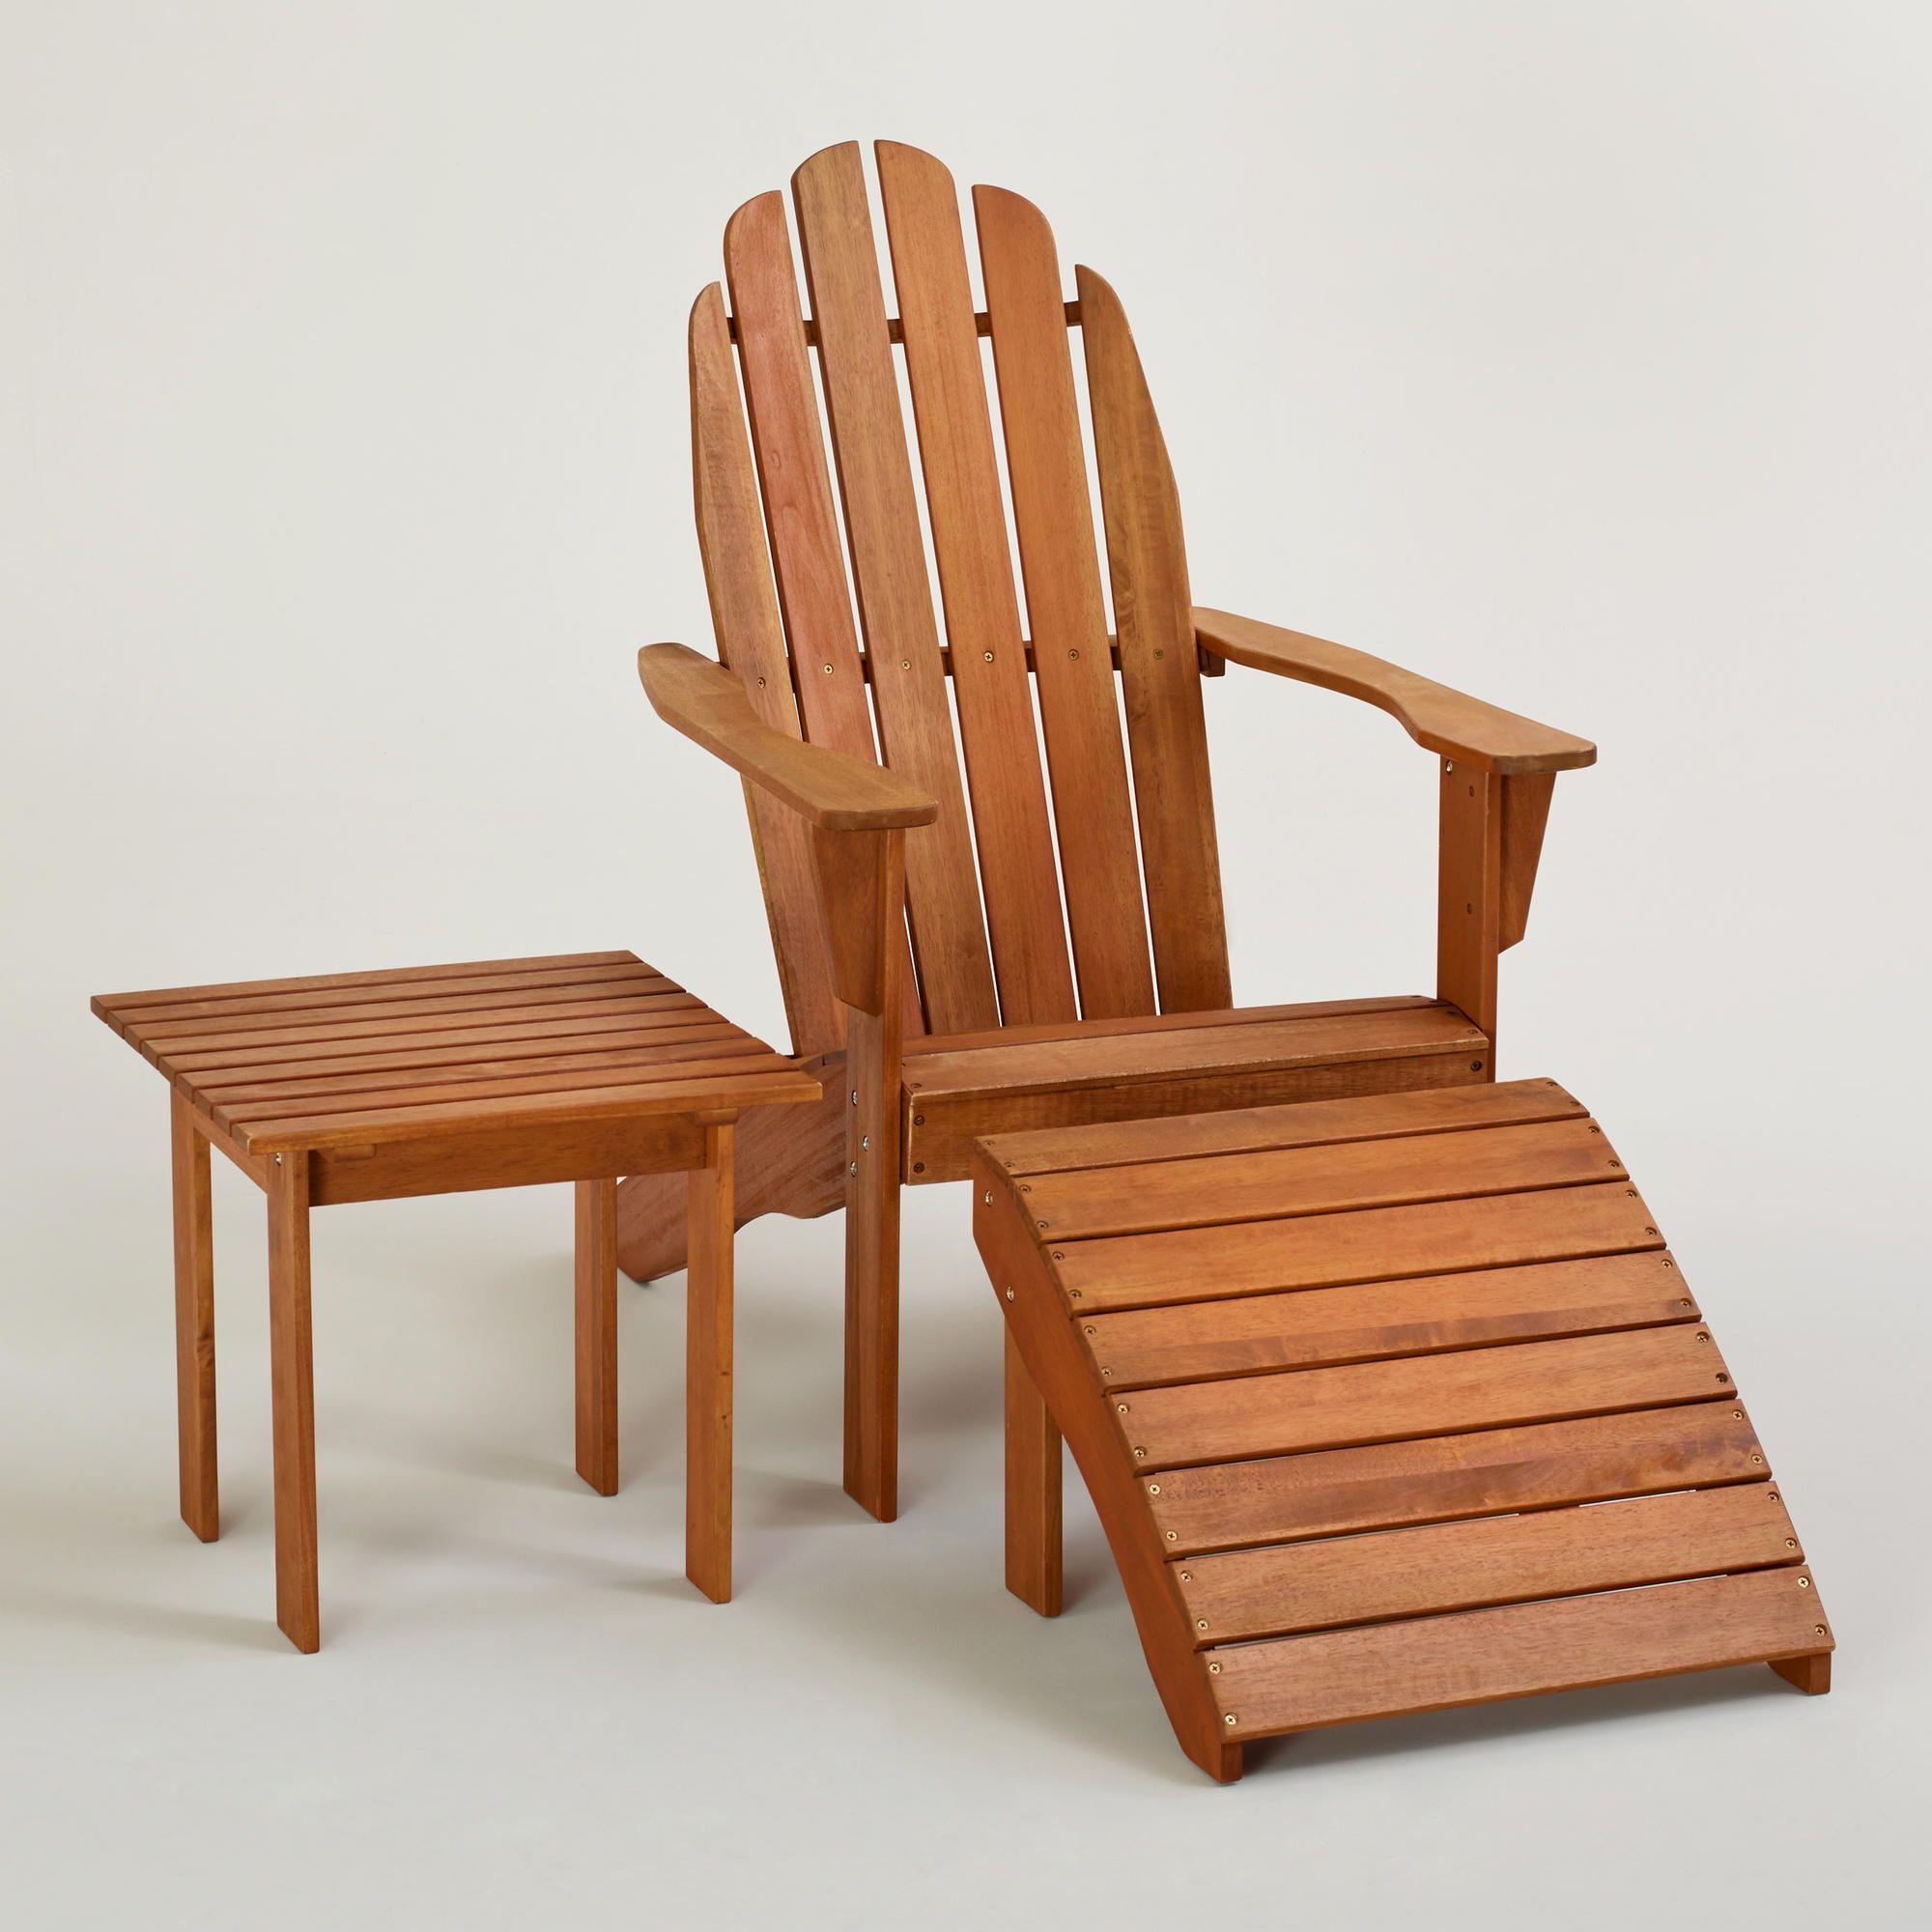 Adirondack Chairs Outdoor Furniture Outdoor Worldmarket